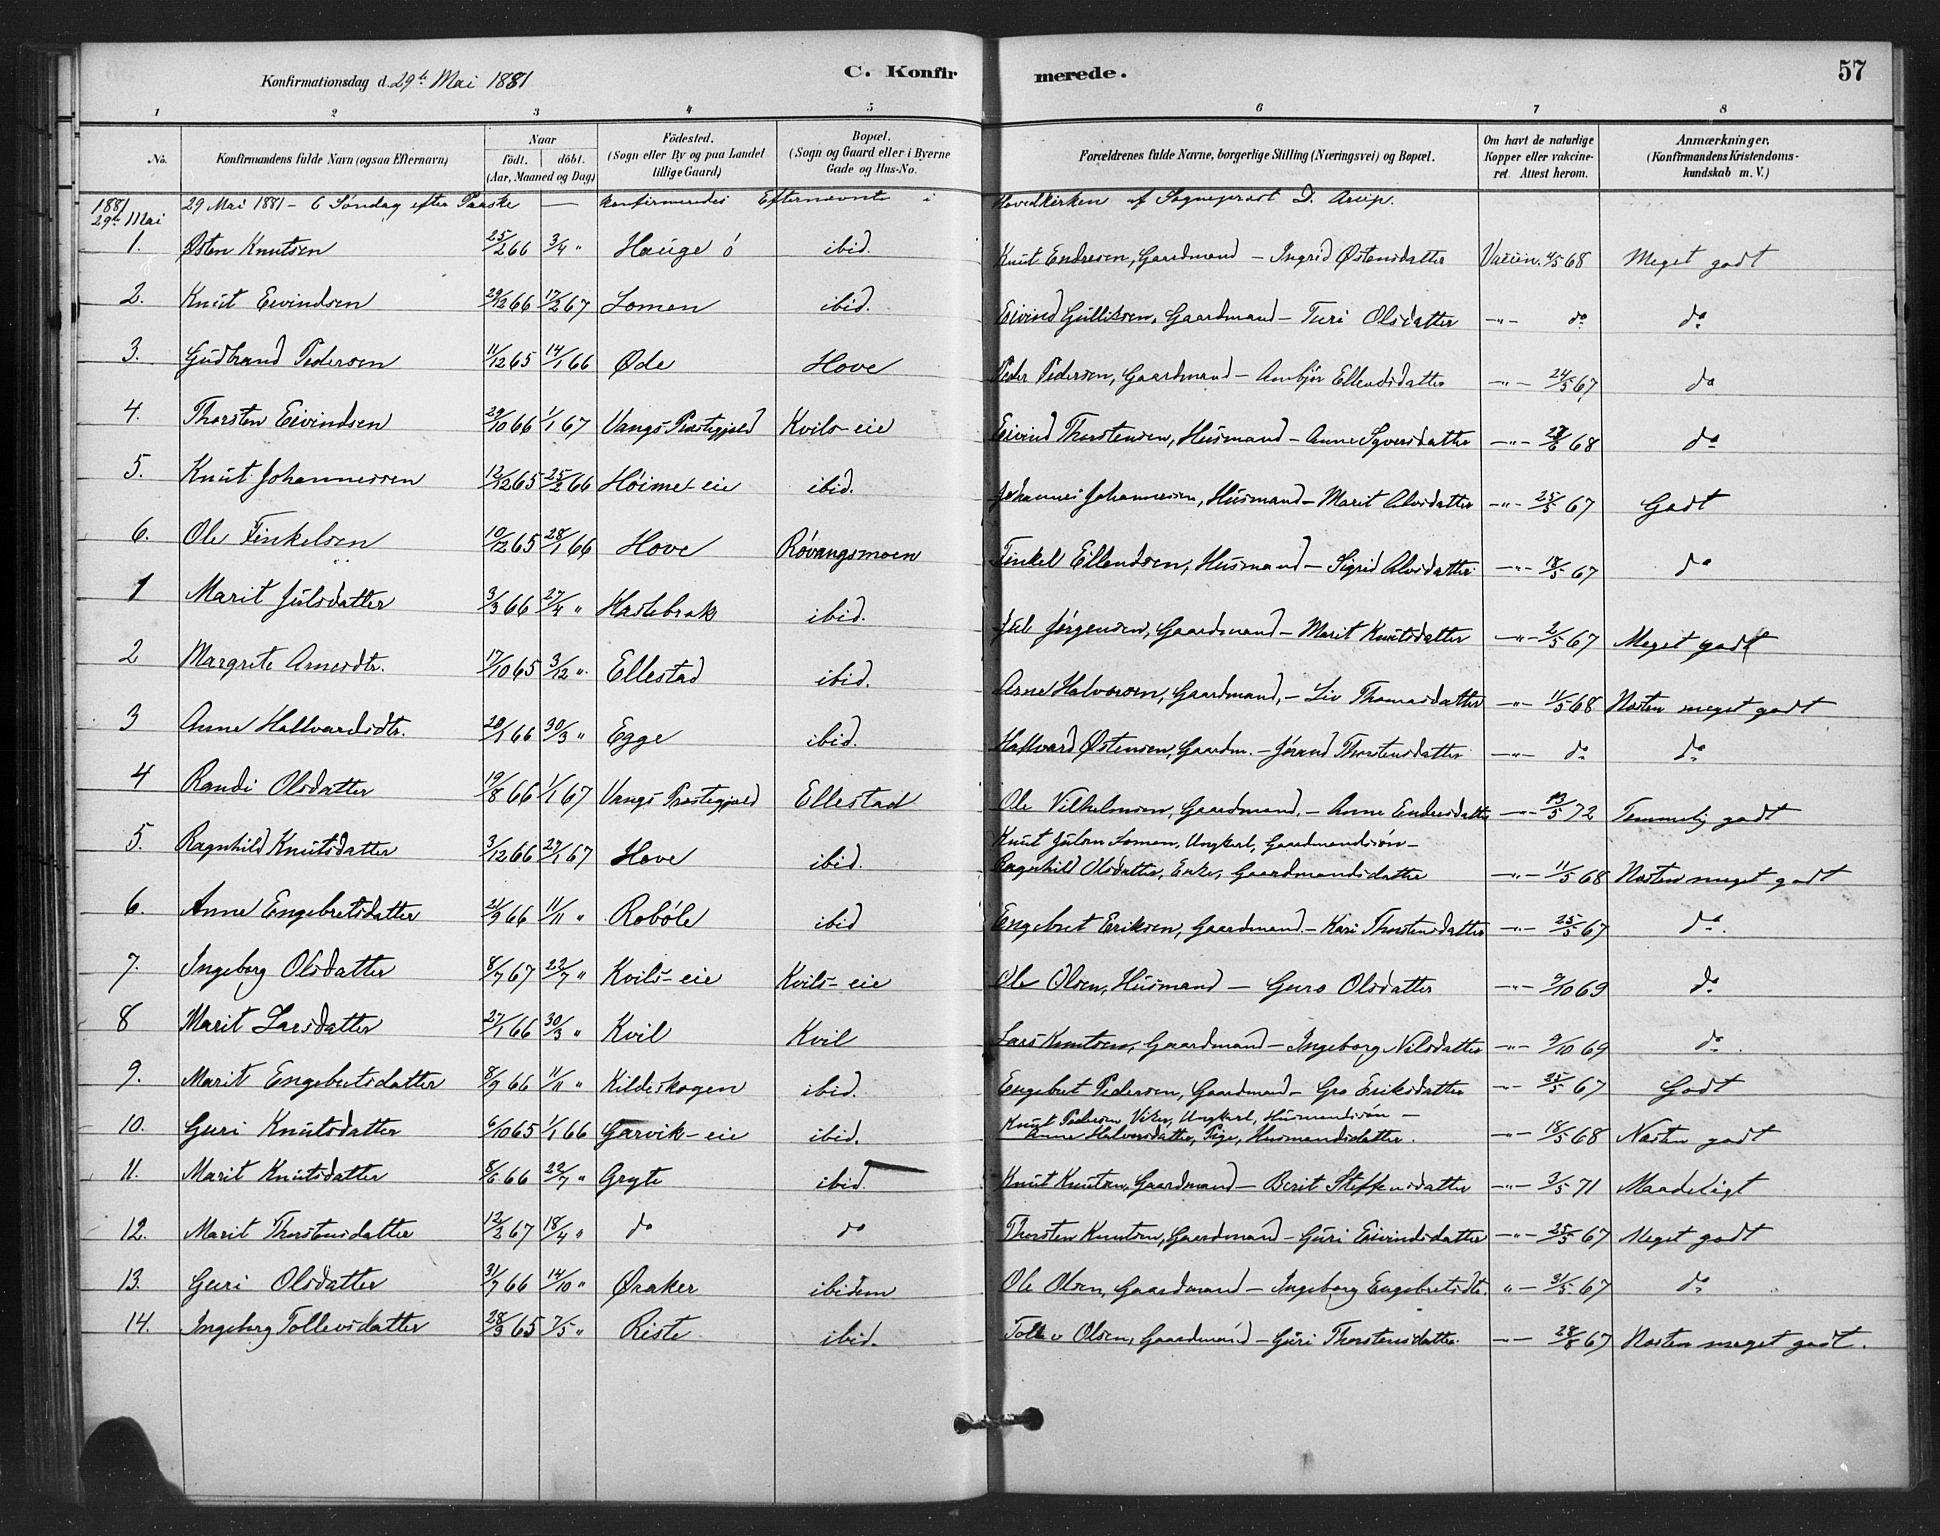 SAH, Vestre Slidre prestekontor, Klokkerbok nr. 6, 1881-1915, s. 57